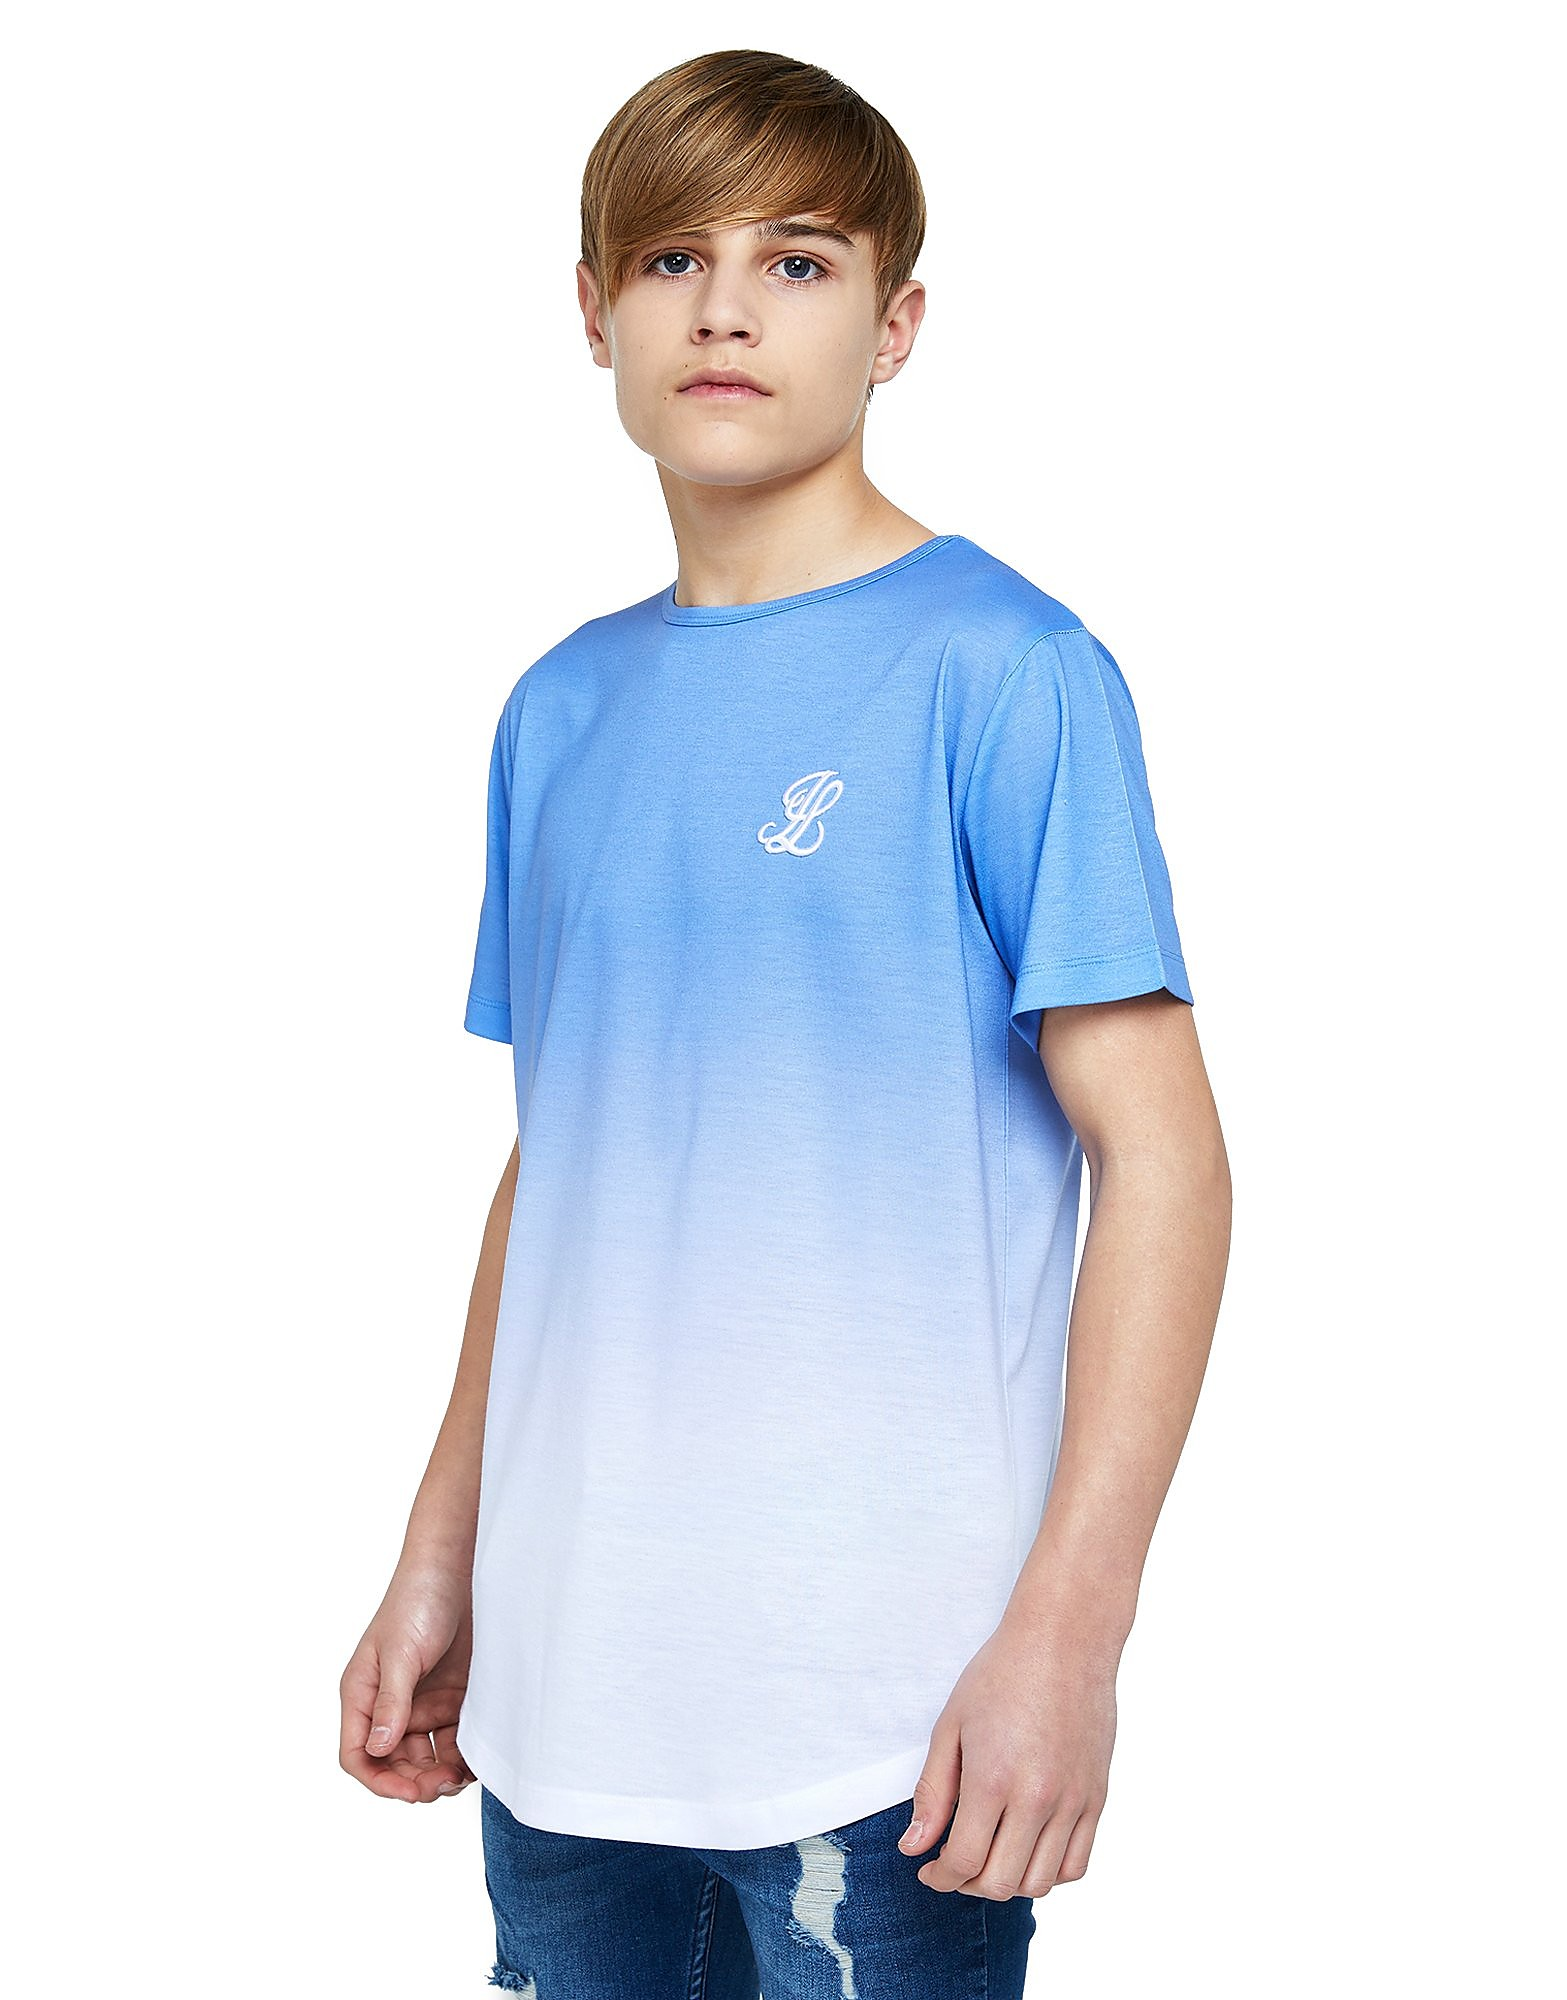 ILLUSIVE LONDON camiseta Fade júnior